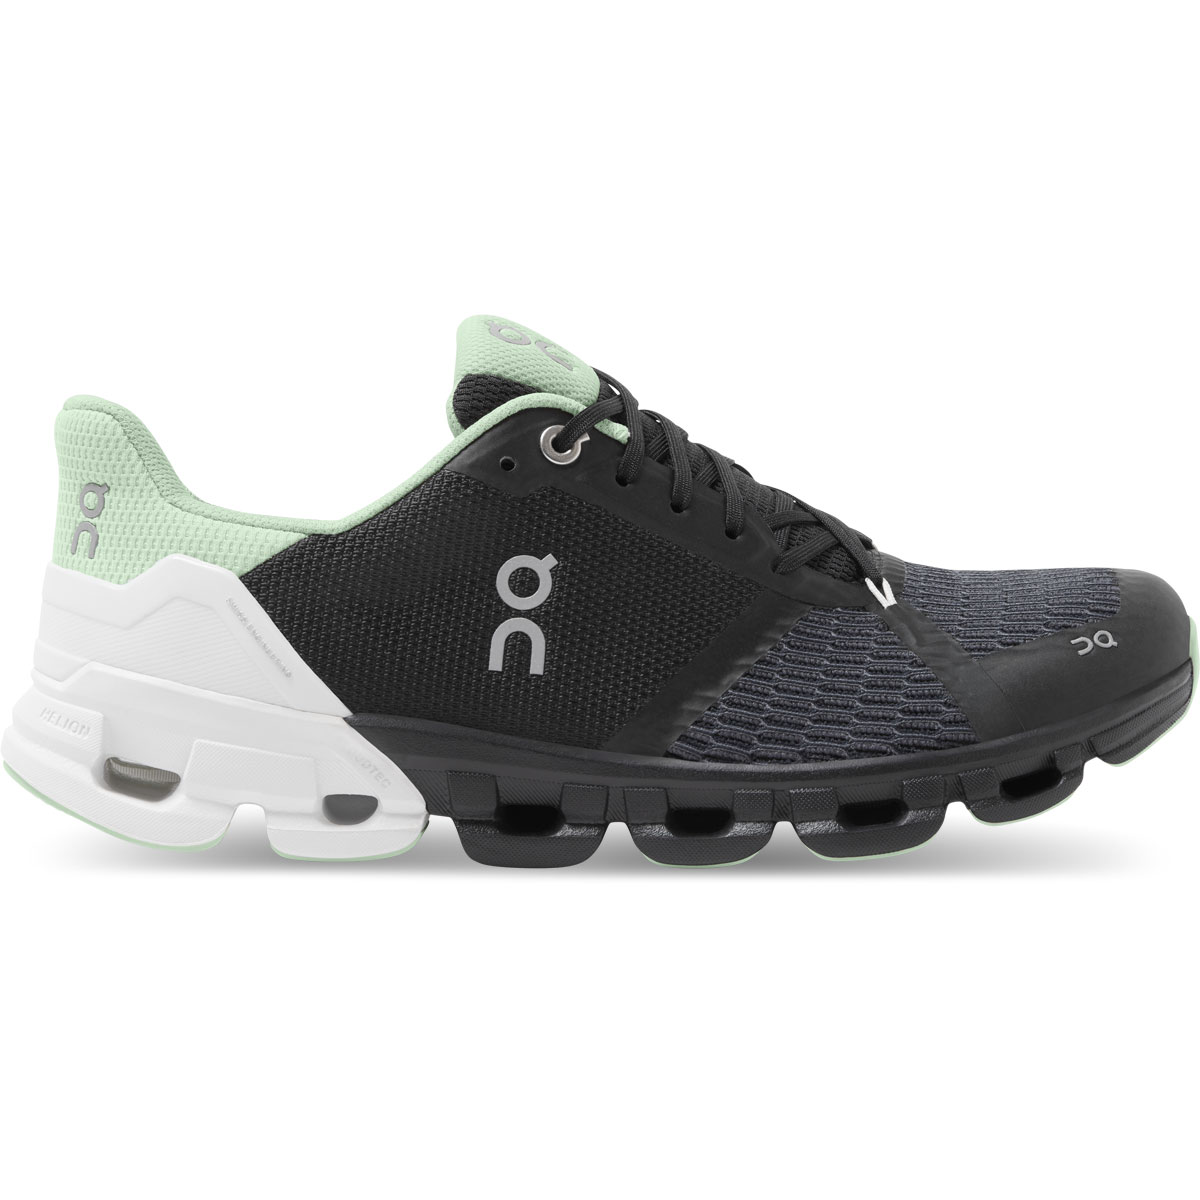 Women's On Cloudflyer 2.0 Running Shoe - Color: Black/White - Size: 5 - Width: Regular, Black/White, large, image 1